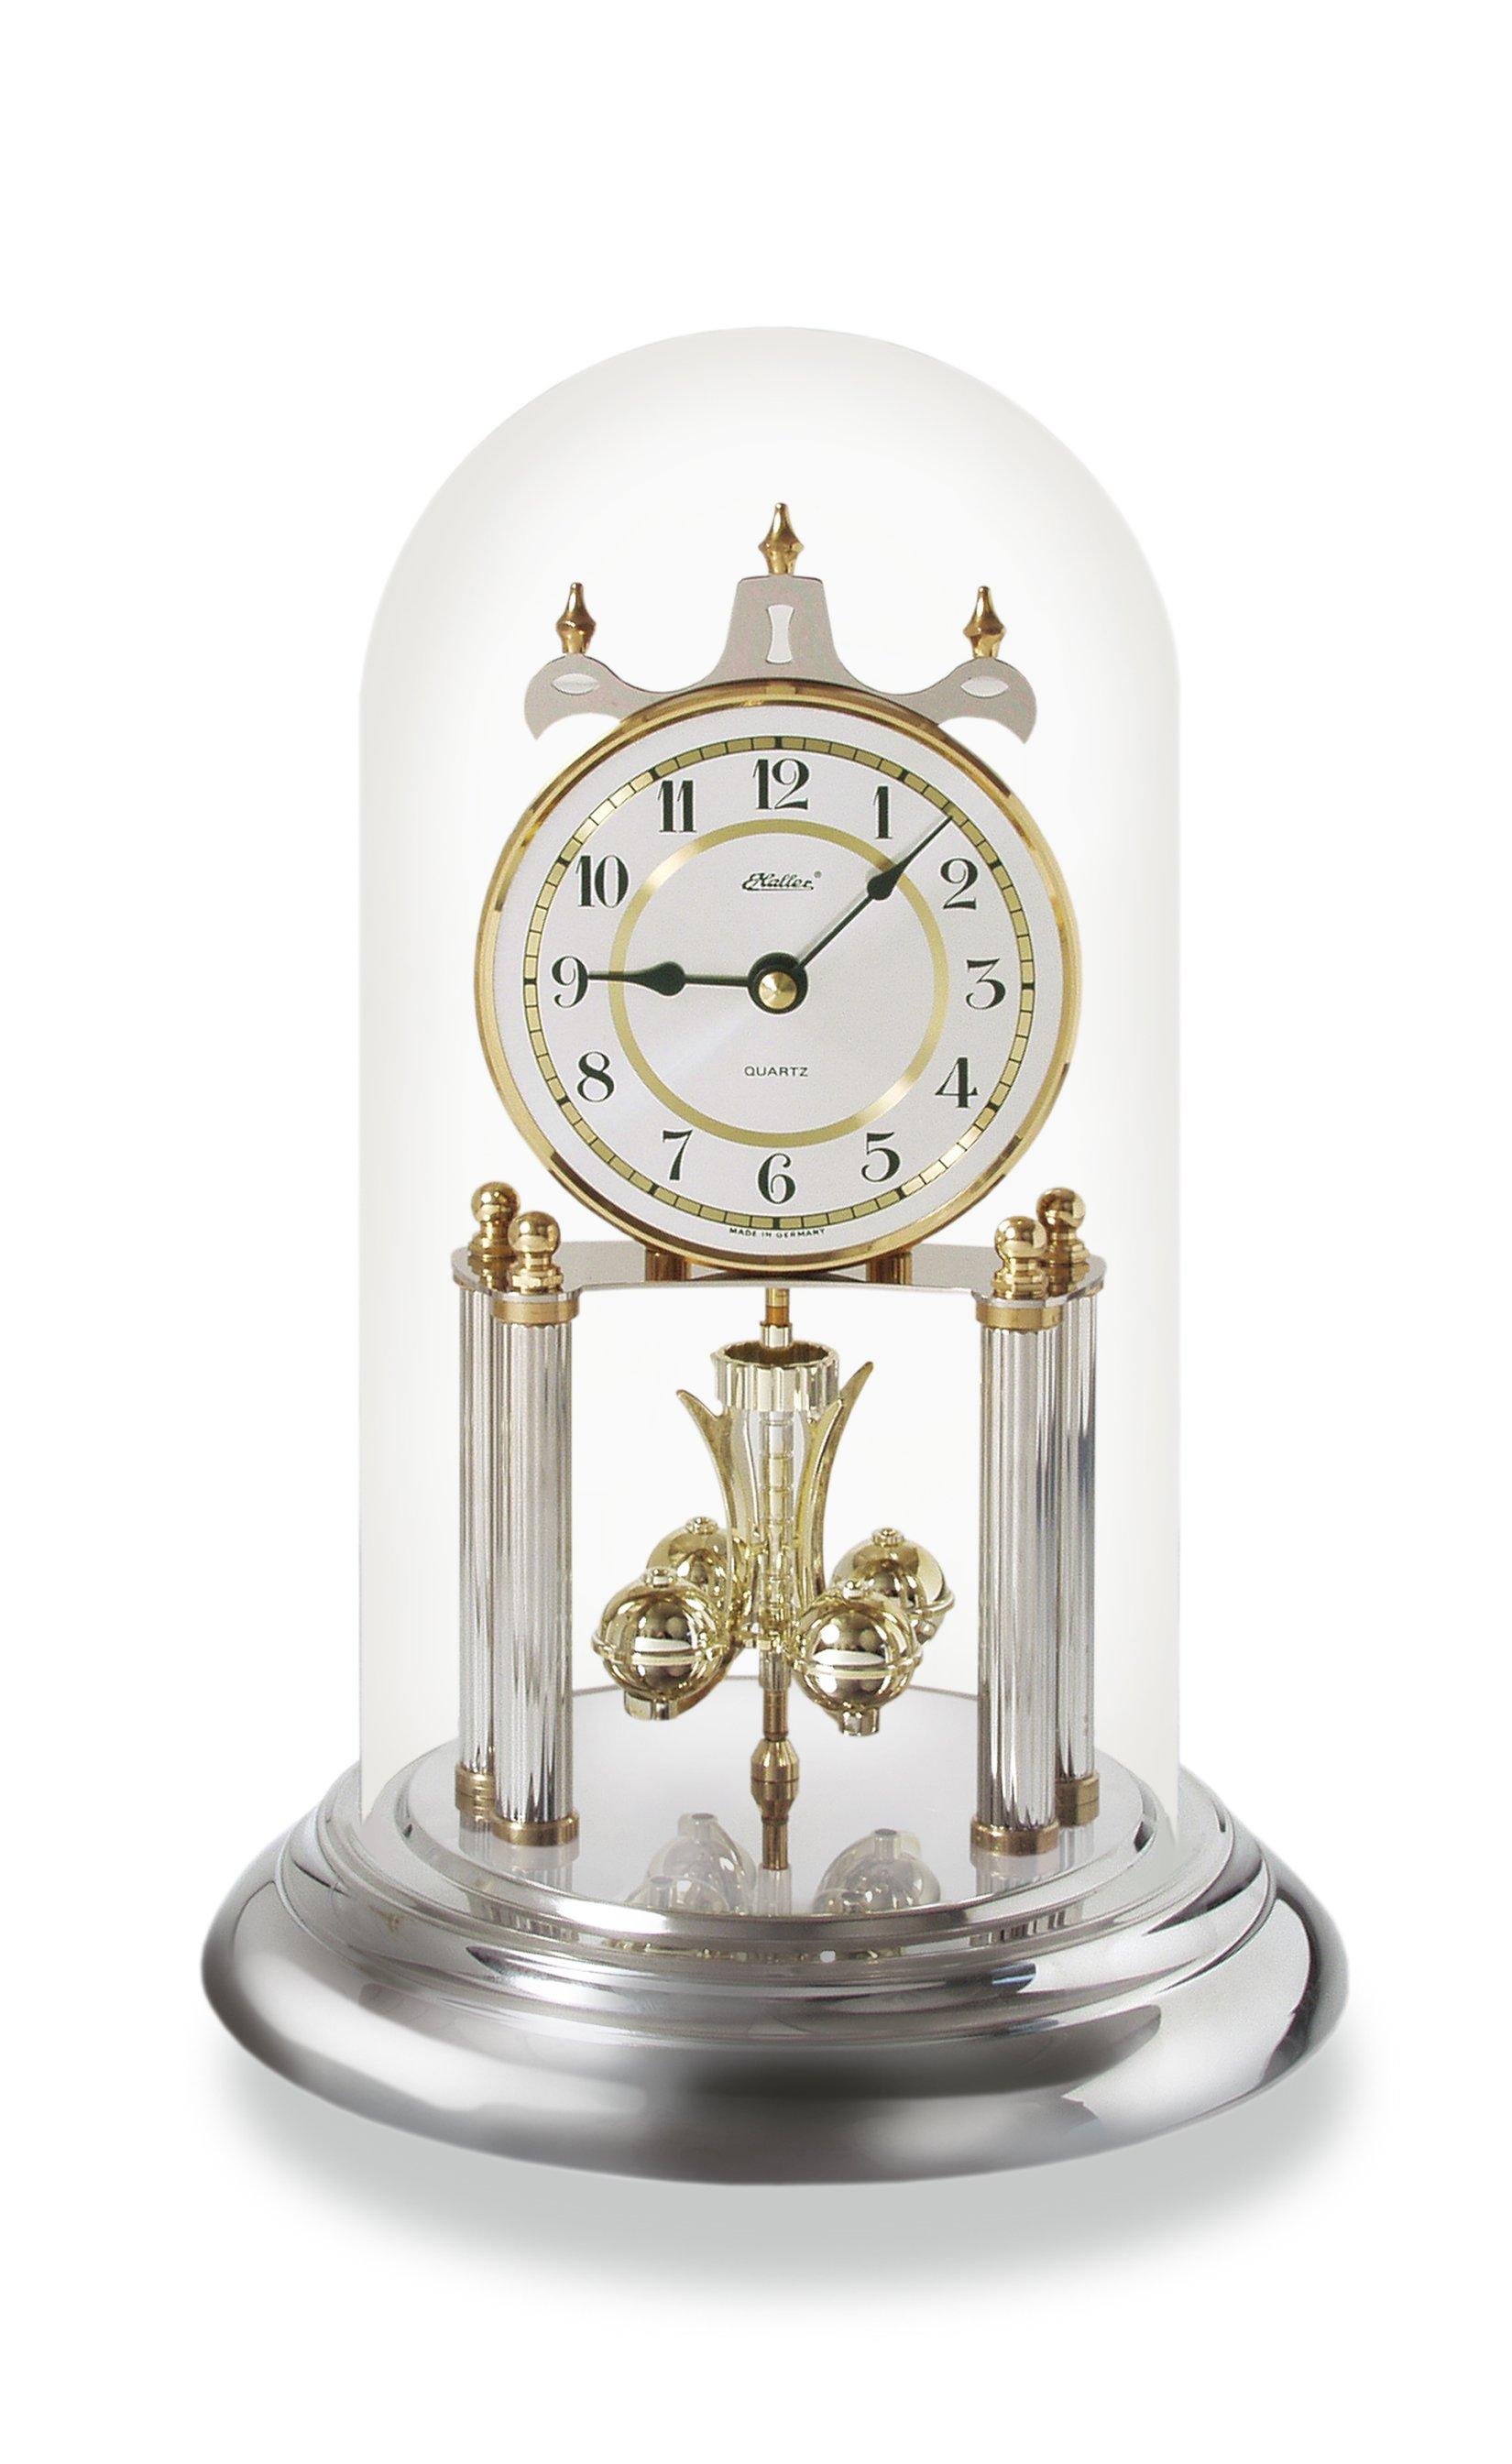 Haller anniversary clock Paula